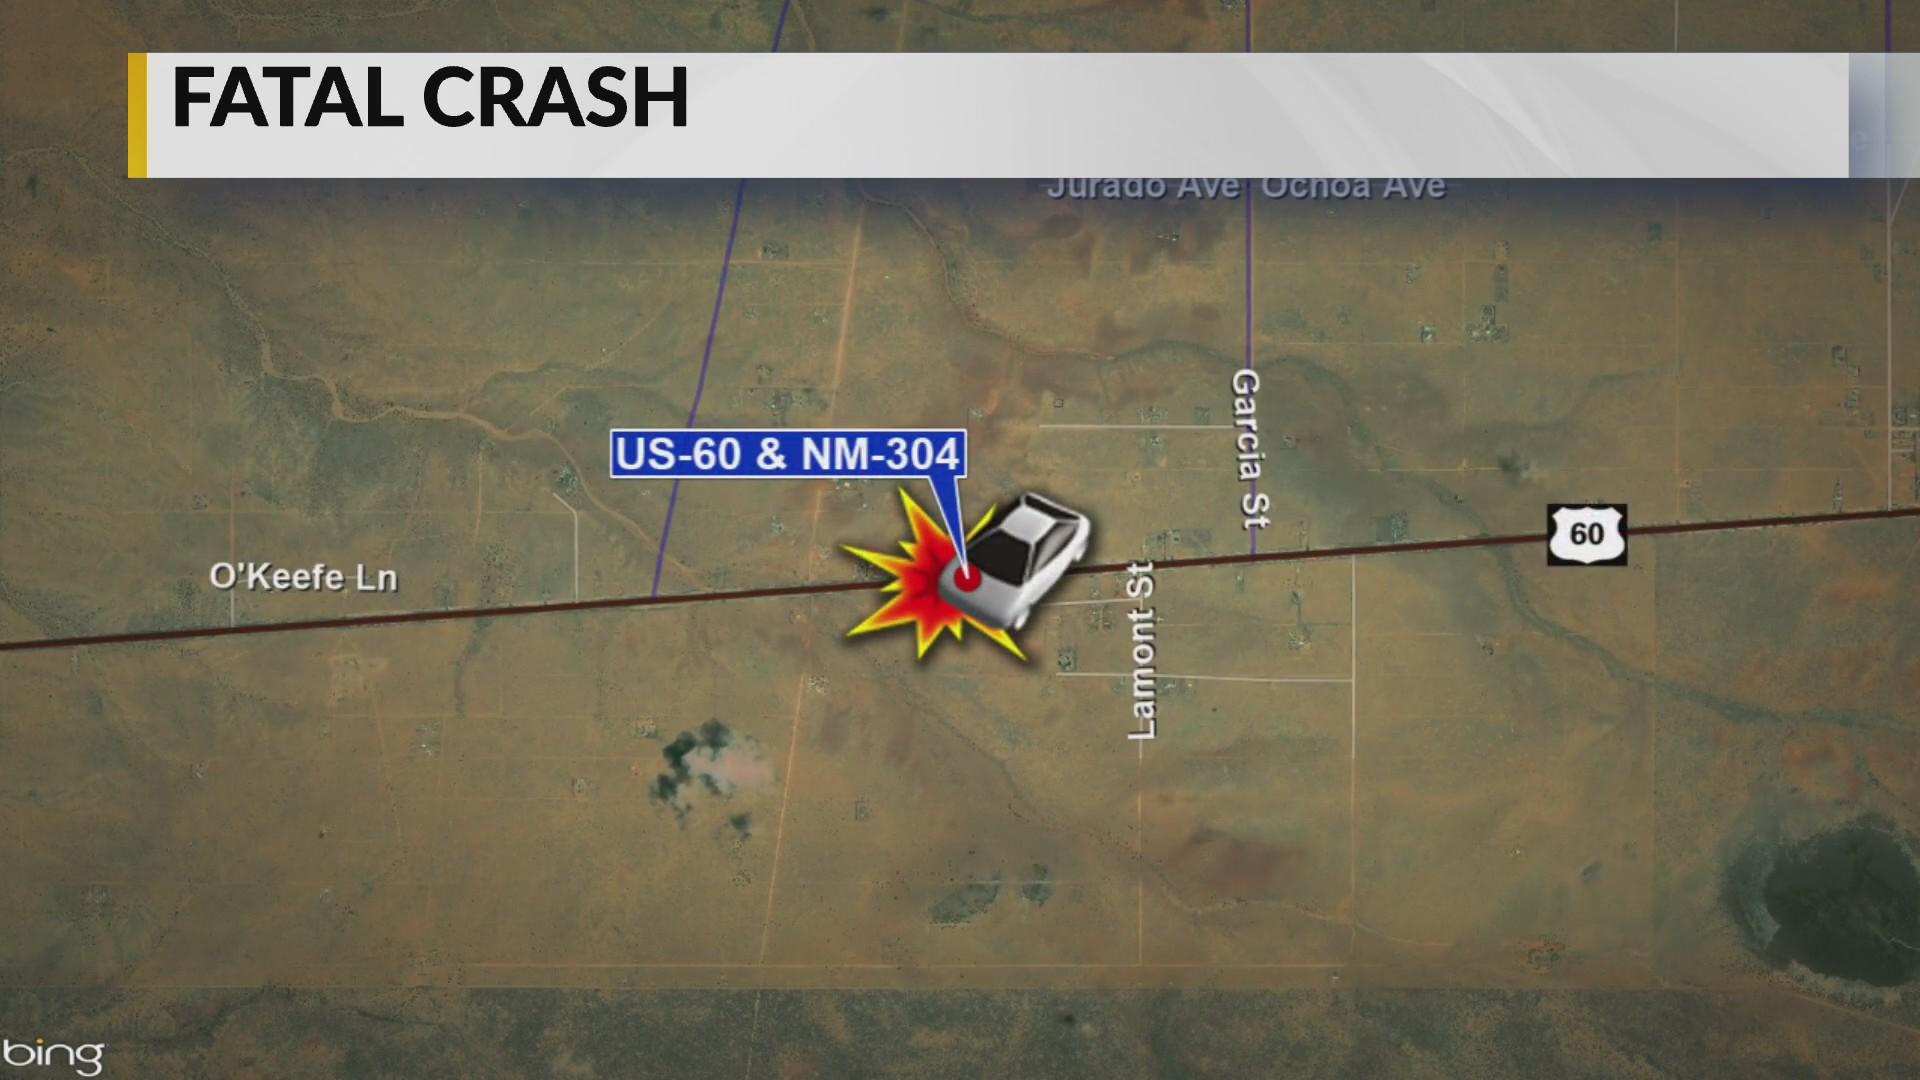 Socorro Nm Halloween 2020 Socorro County crash kills 2, hospitalizes 1 | KRQE News 13